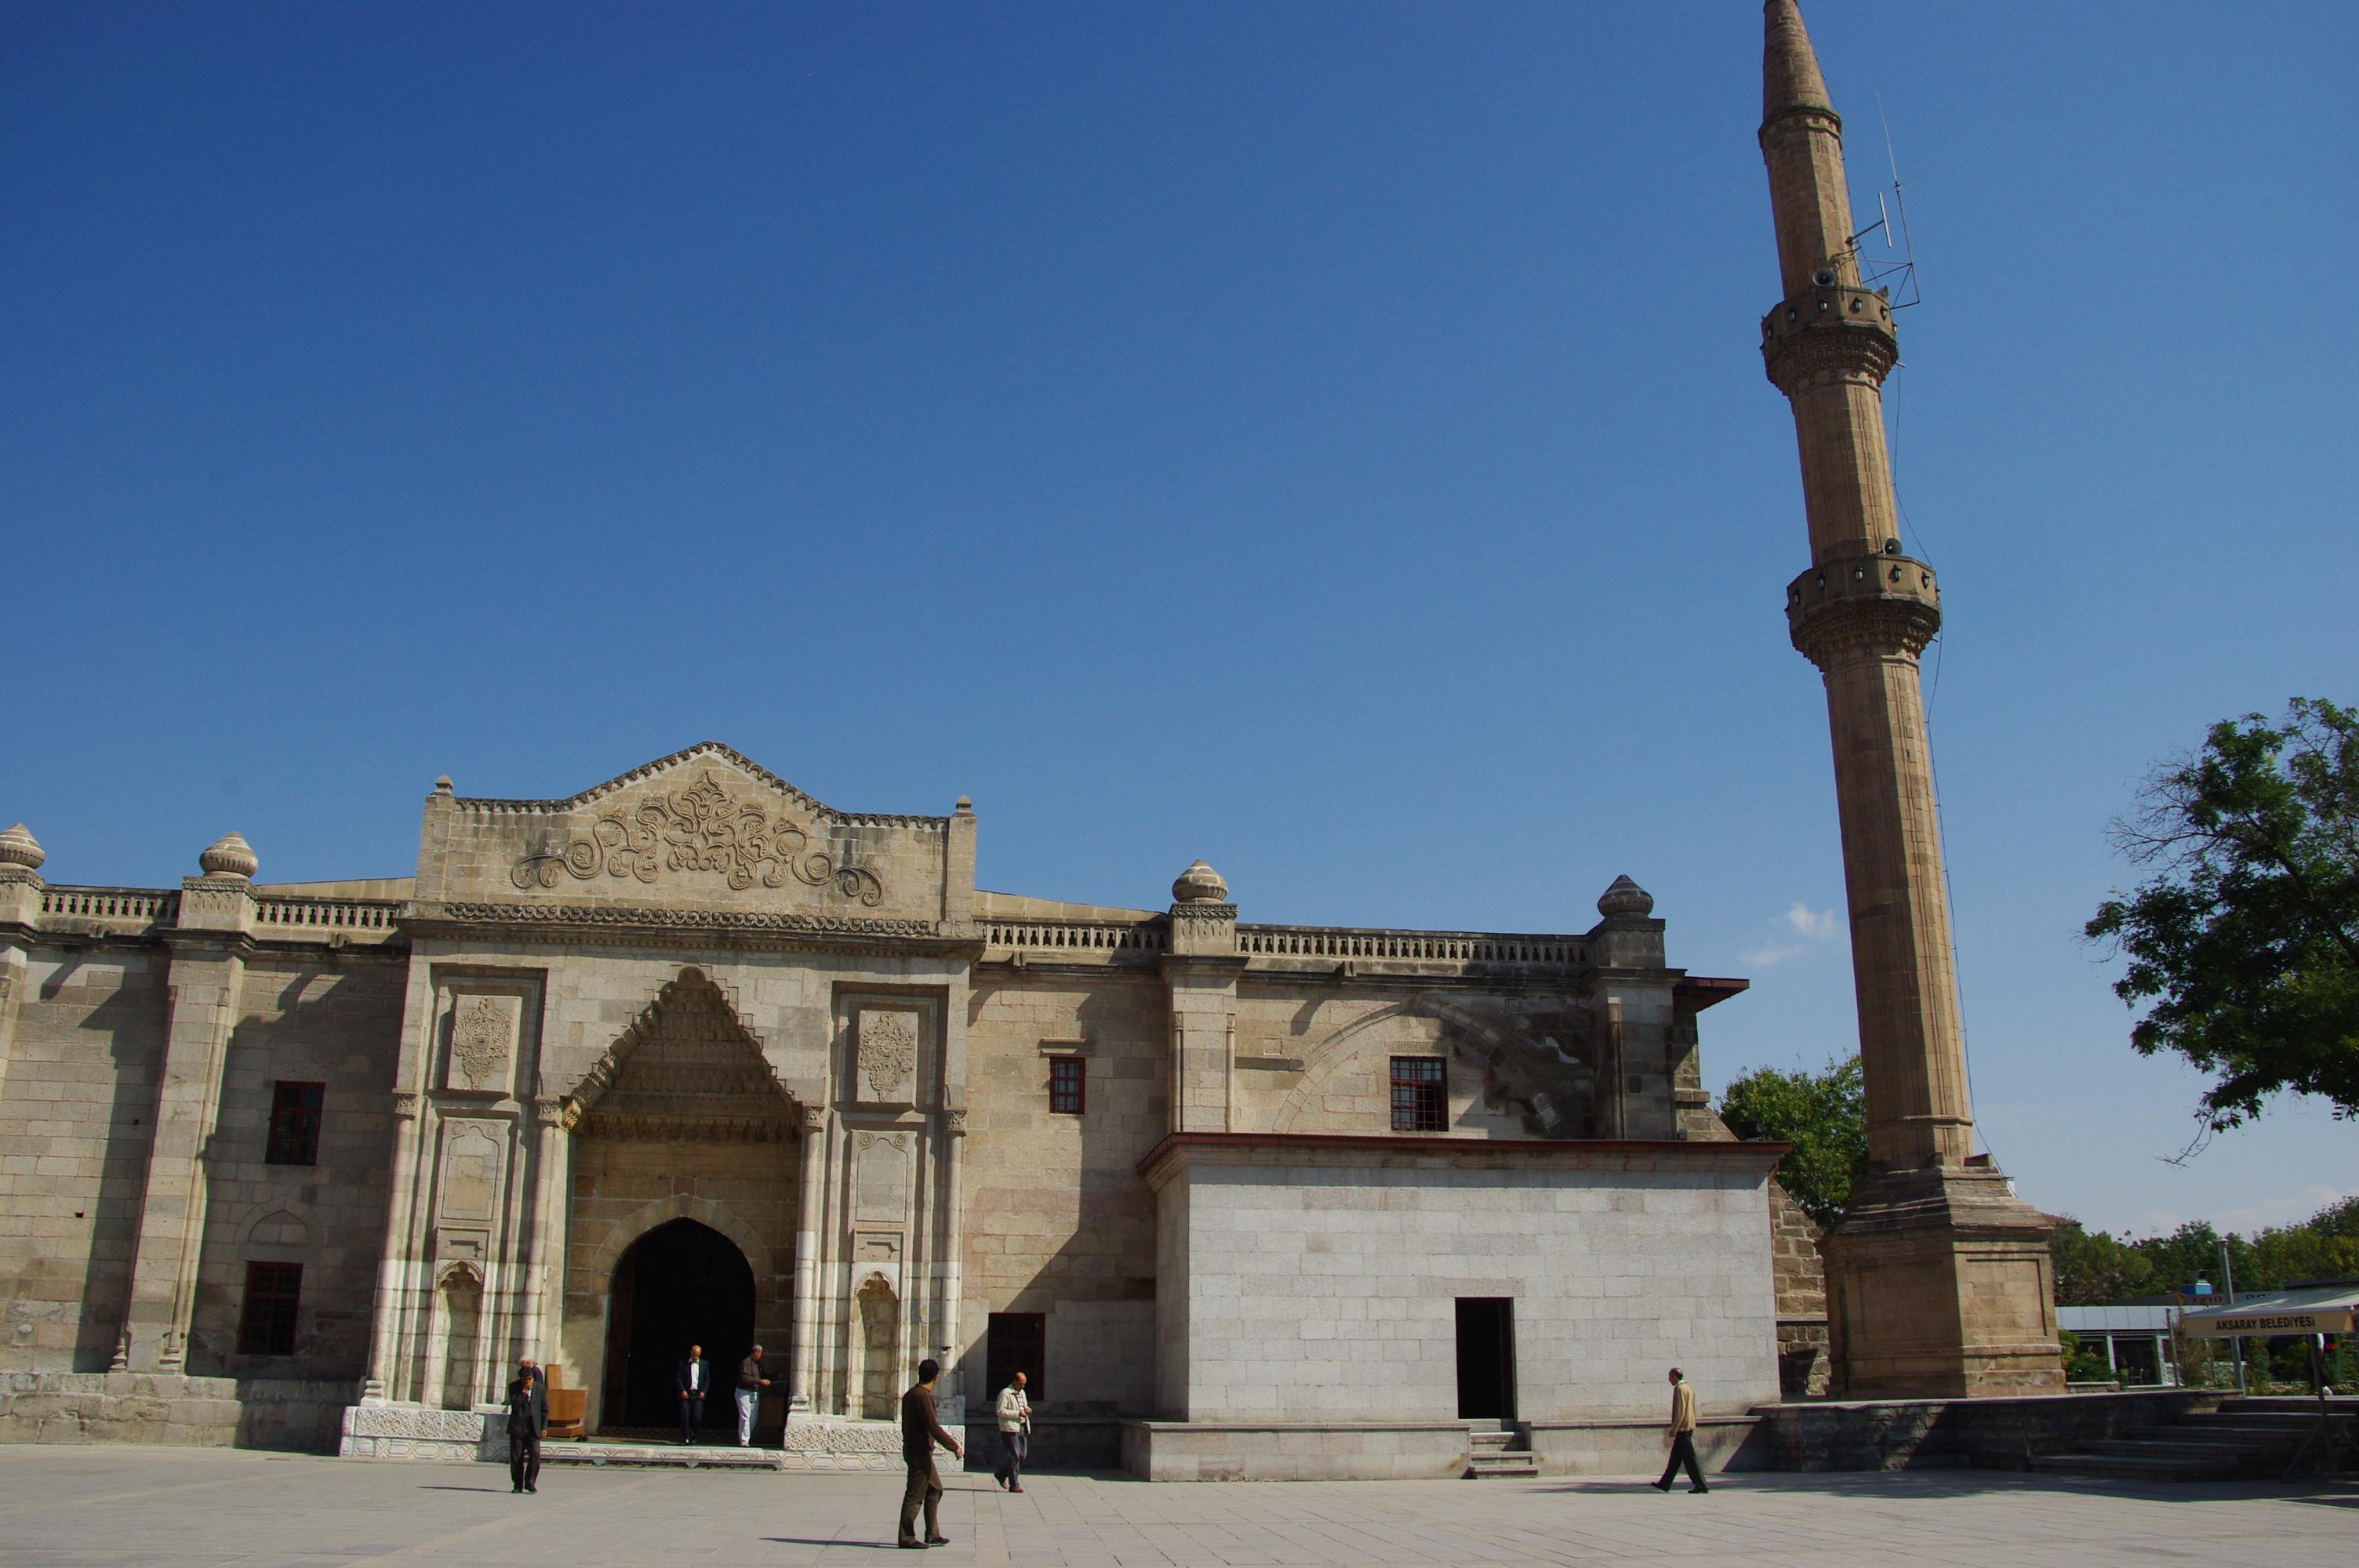 File:Aksaray ulu camii.jpg - Wikimedia Commons